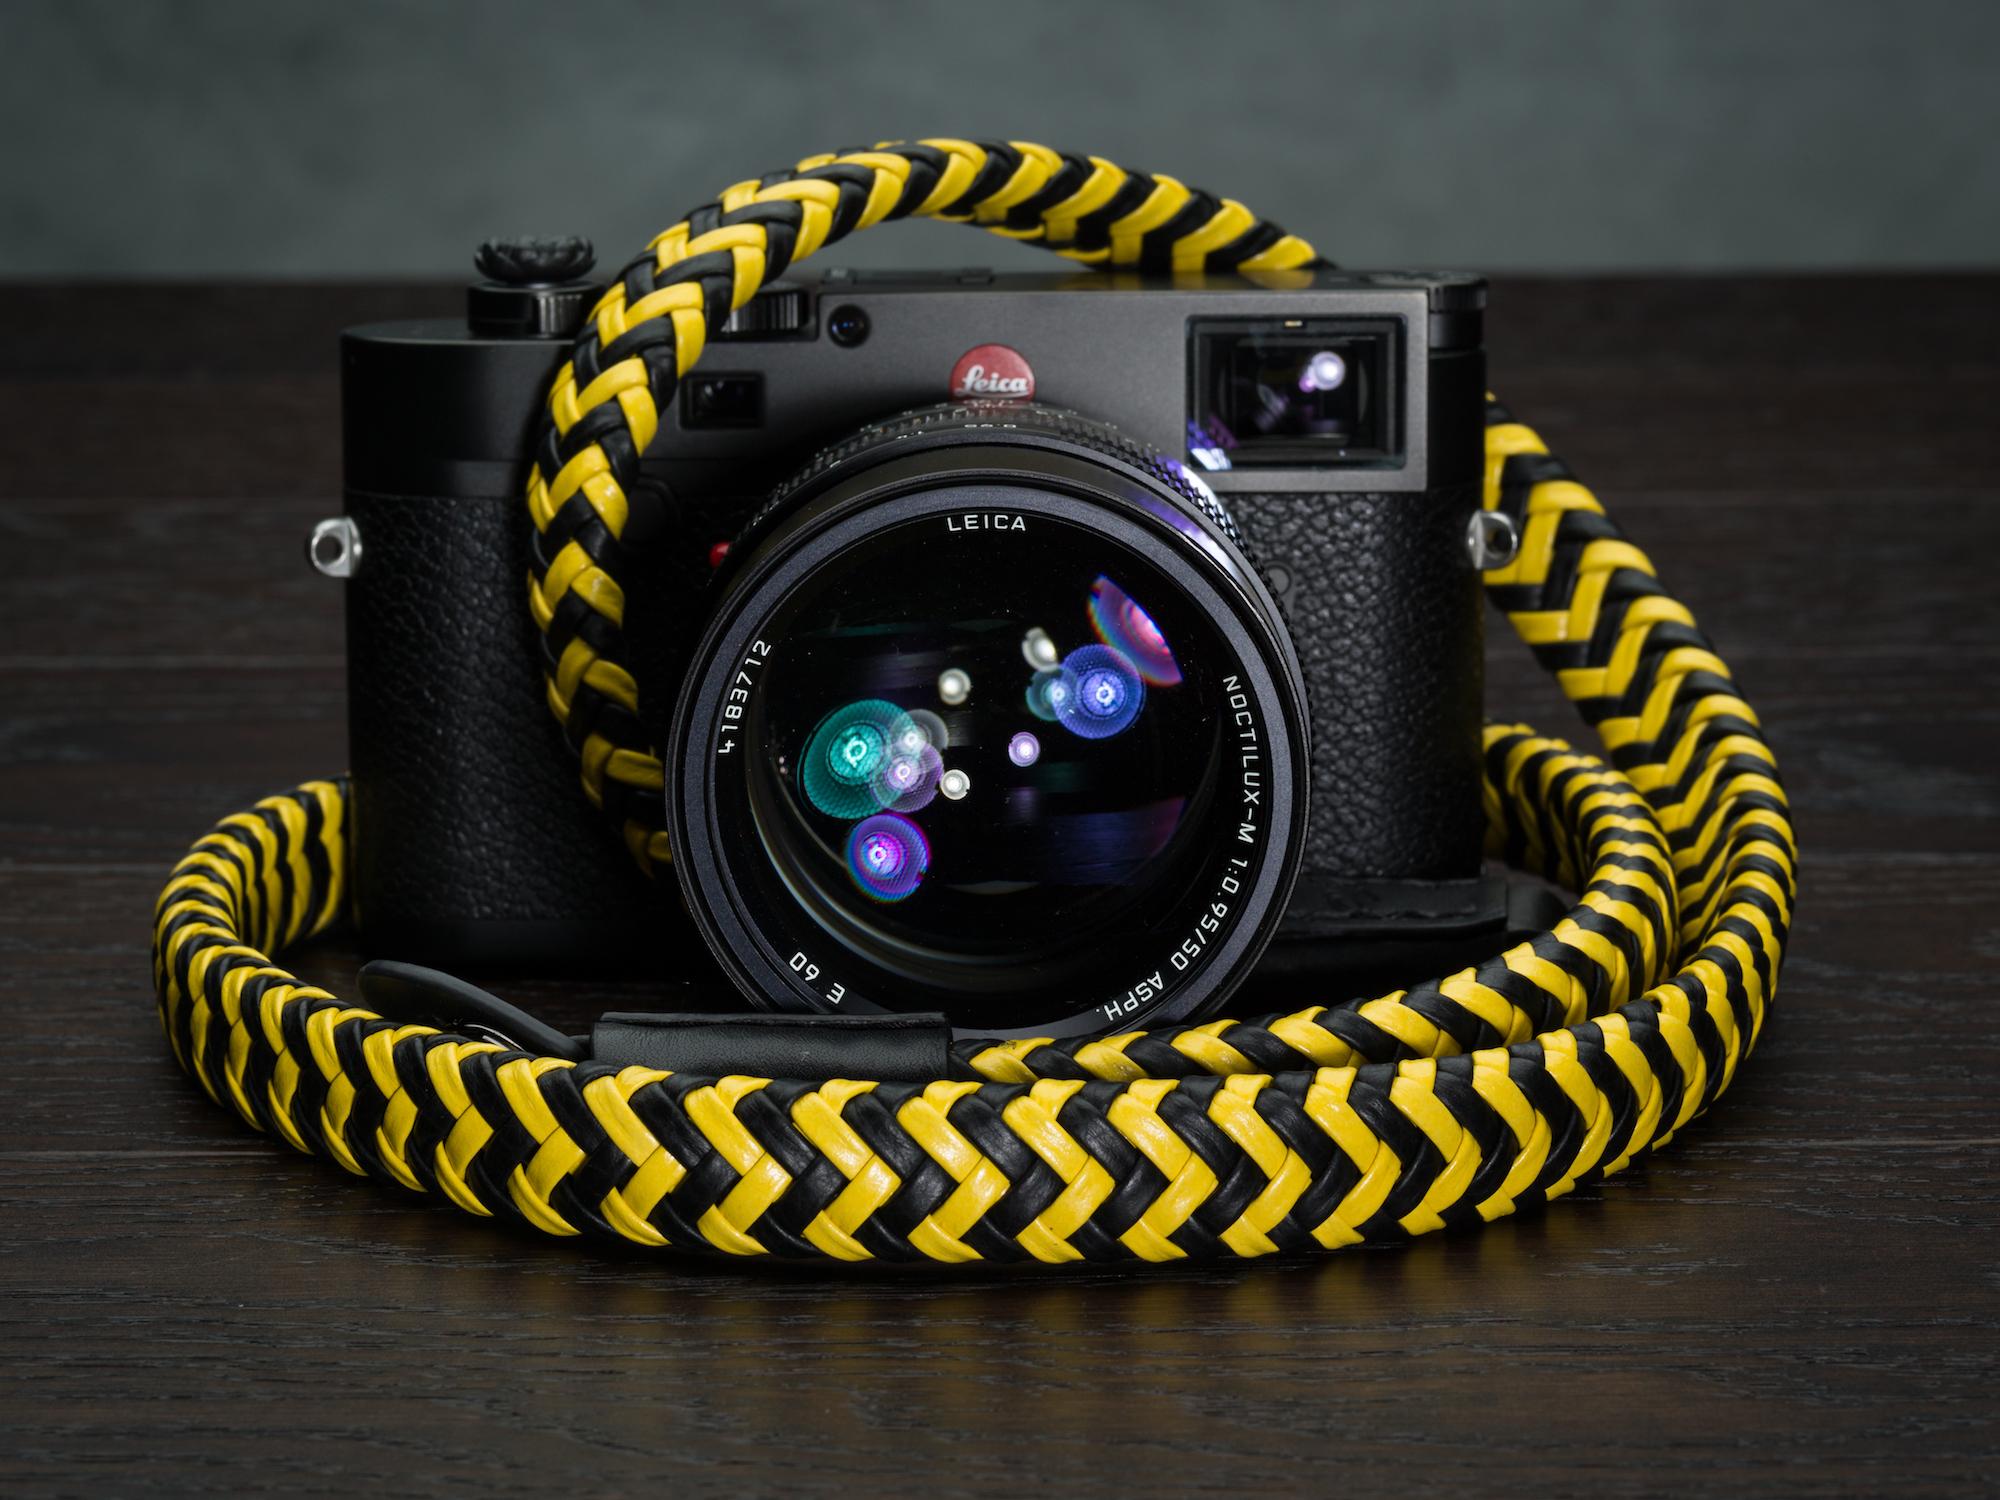 Vi Vante Matador Batman Braided Luxury Leather Camera Strap Leica M10 Noctilux 1.jpg